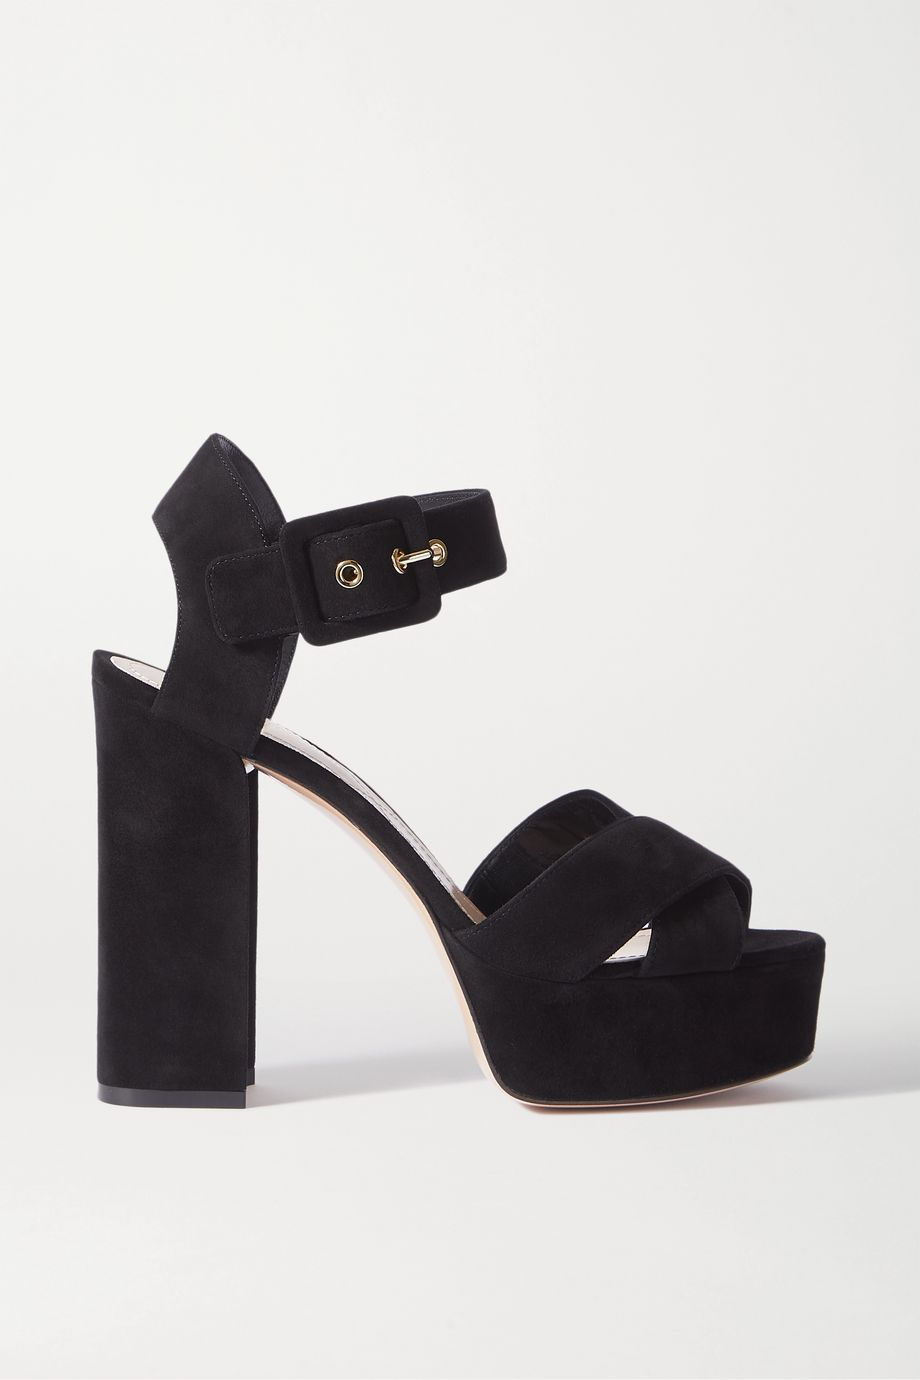 Nicholas Kirkwood Essential suede platform sandals